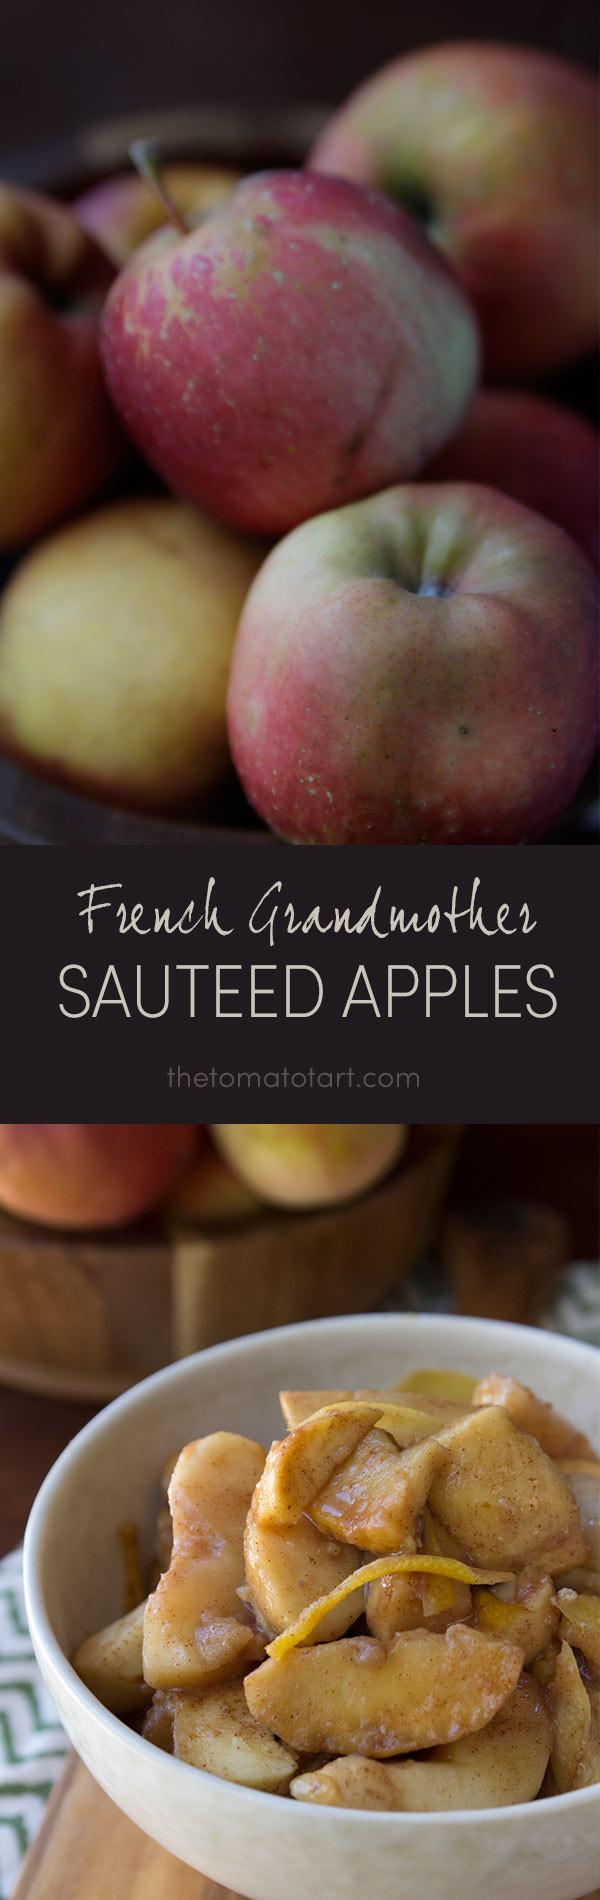 Sautéed Apples with Honey from www.thetomatotart.com